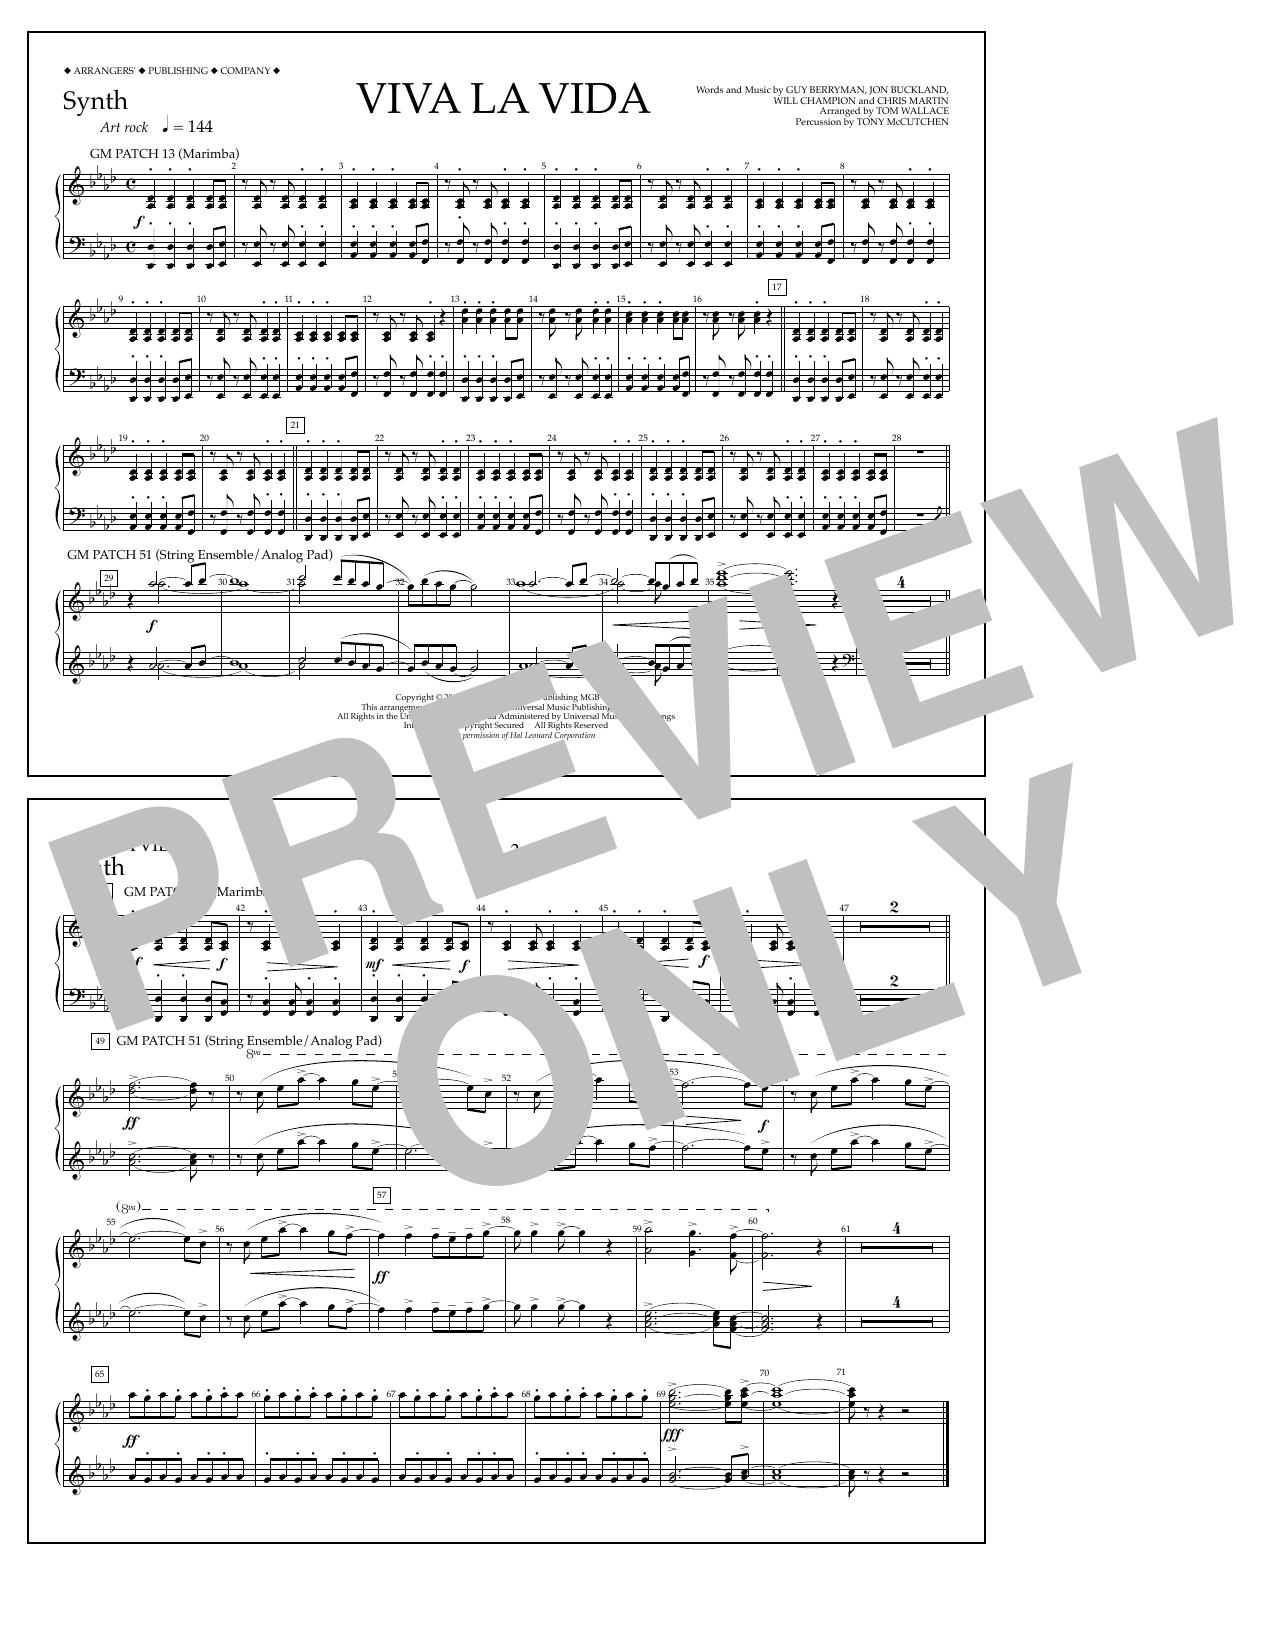 Tom Wallace Viva La Vida - Synthesizer sheet music notes and chords. Download Printable PDF.